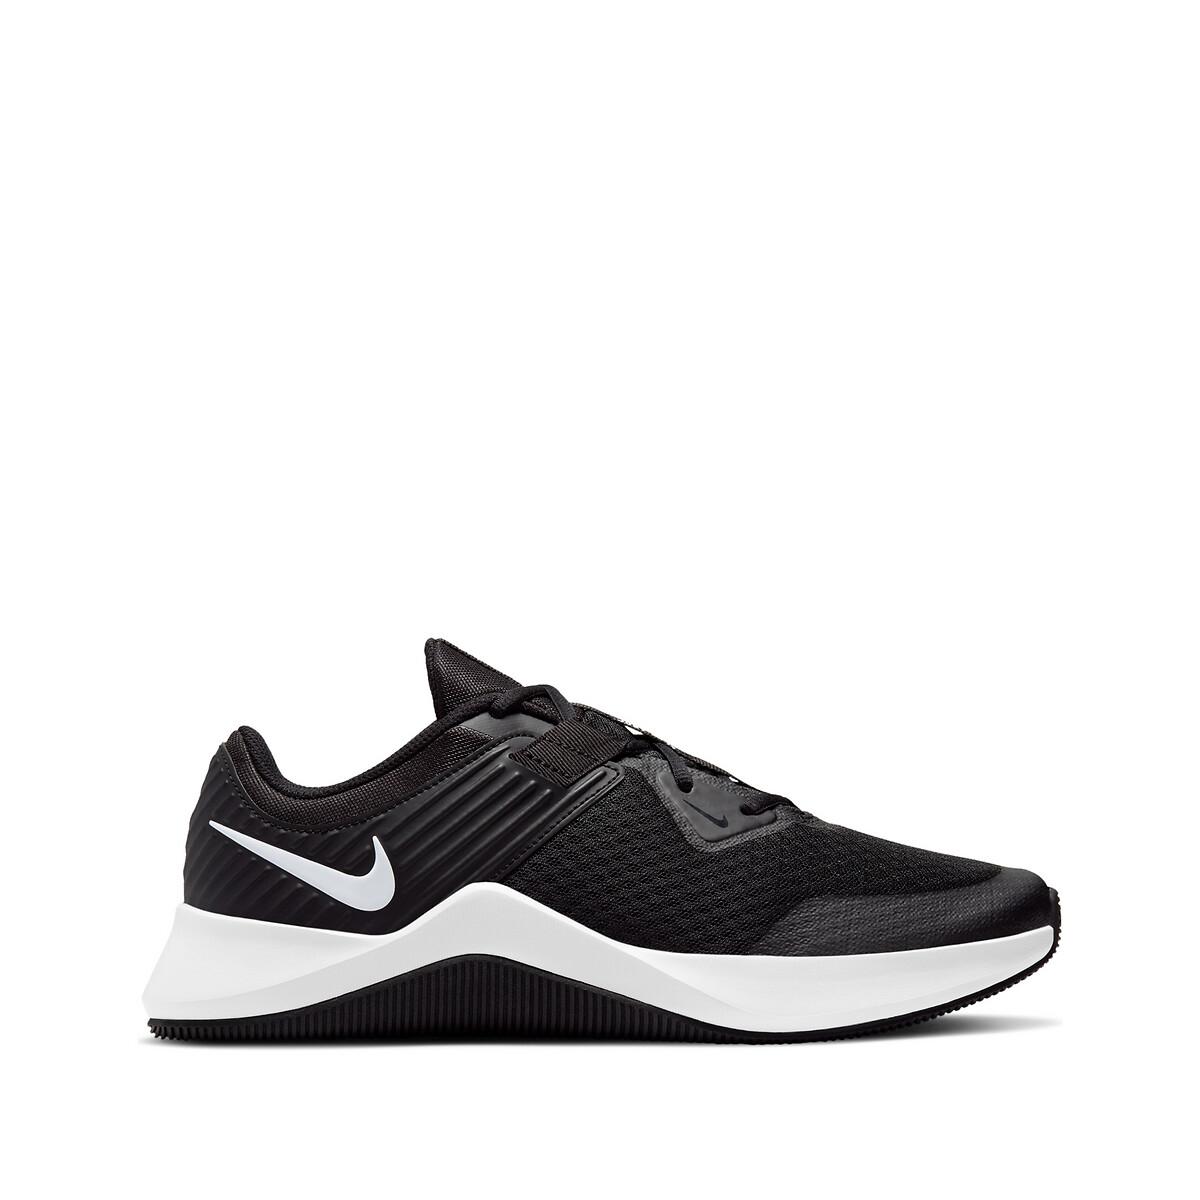 Nike Mc trainer men's training shoe cu3580-002 online kopen